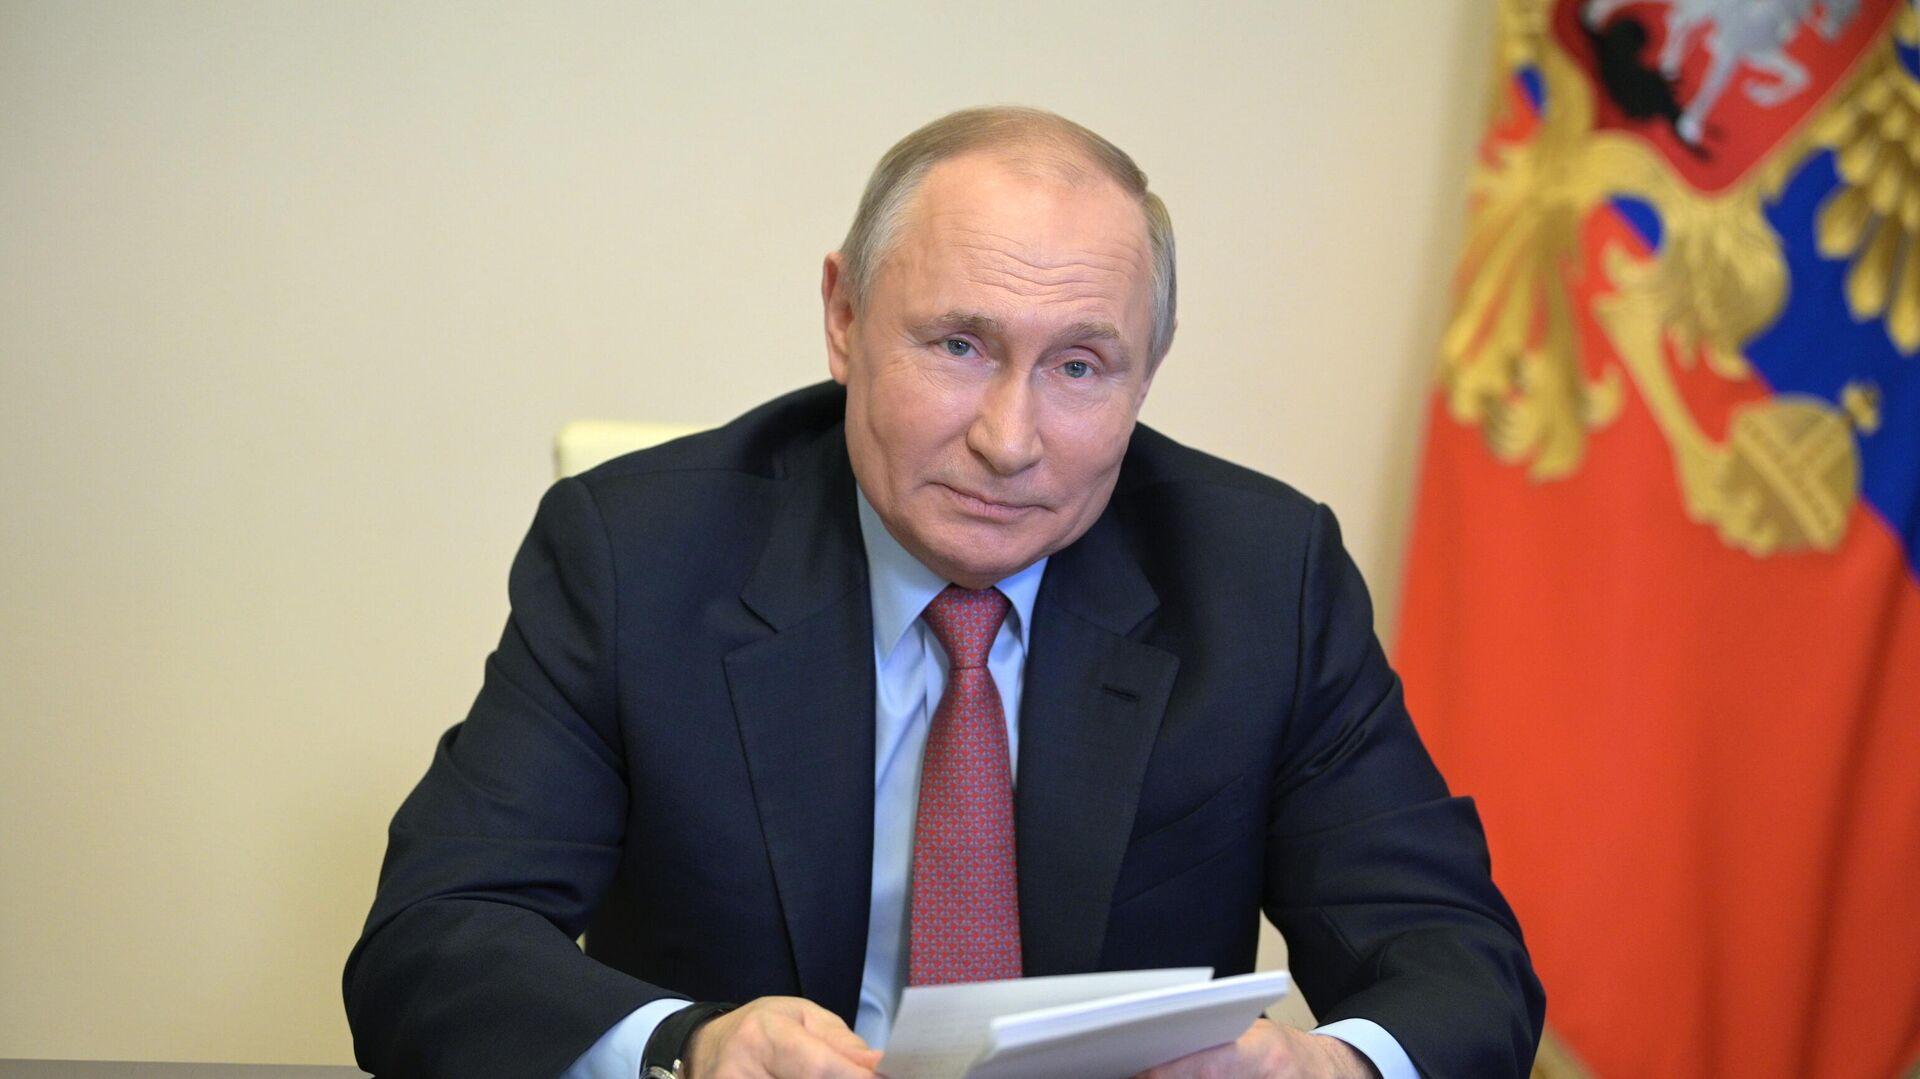 Vladímir Putin, presidente de Rusia - Sputnik Mundo, 1920, 29.04.2021